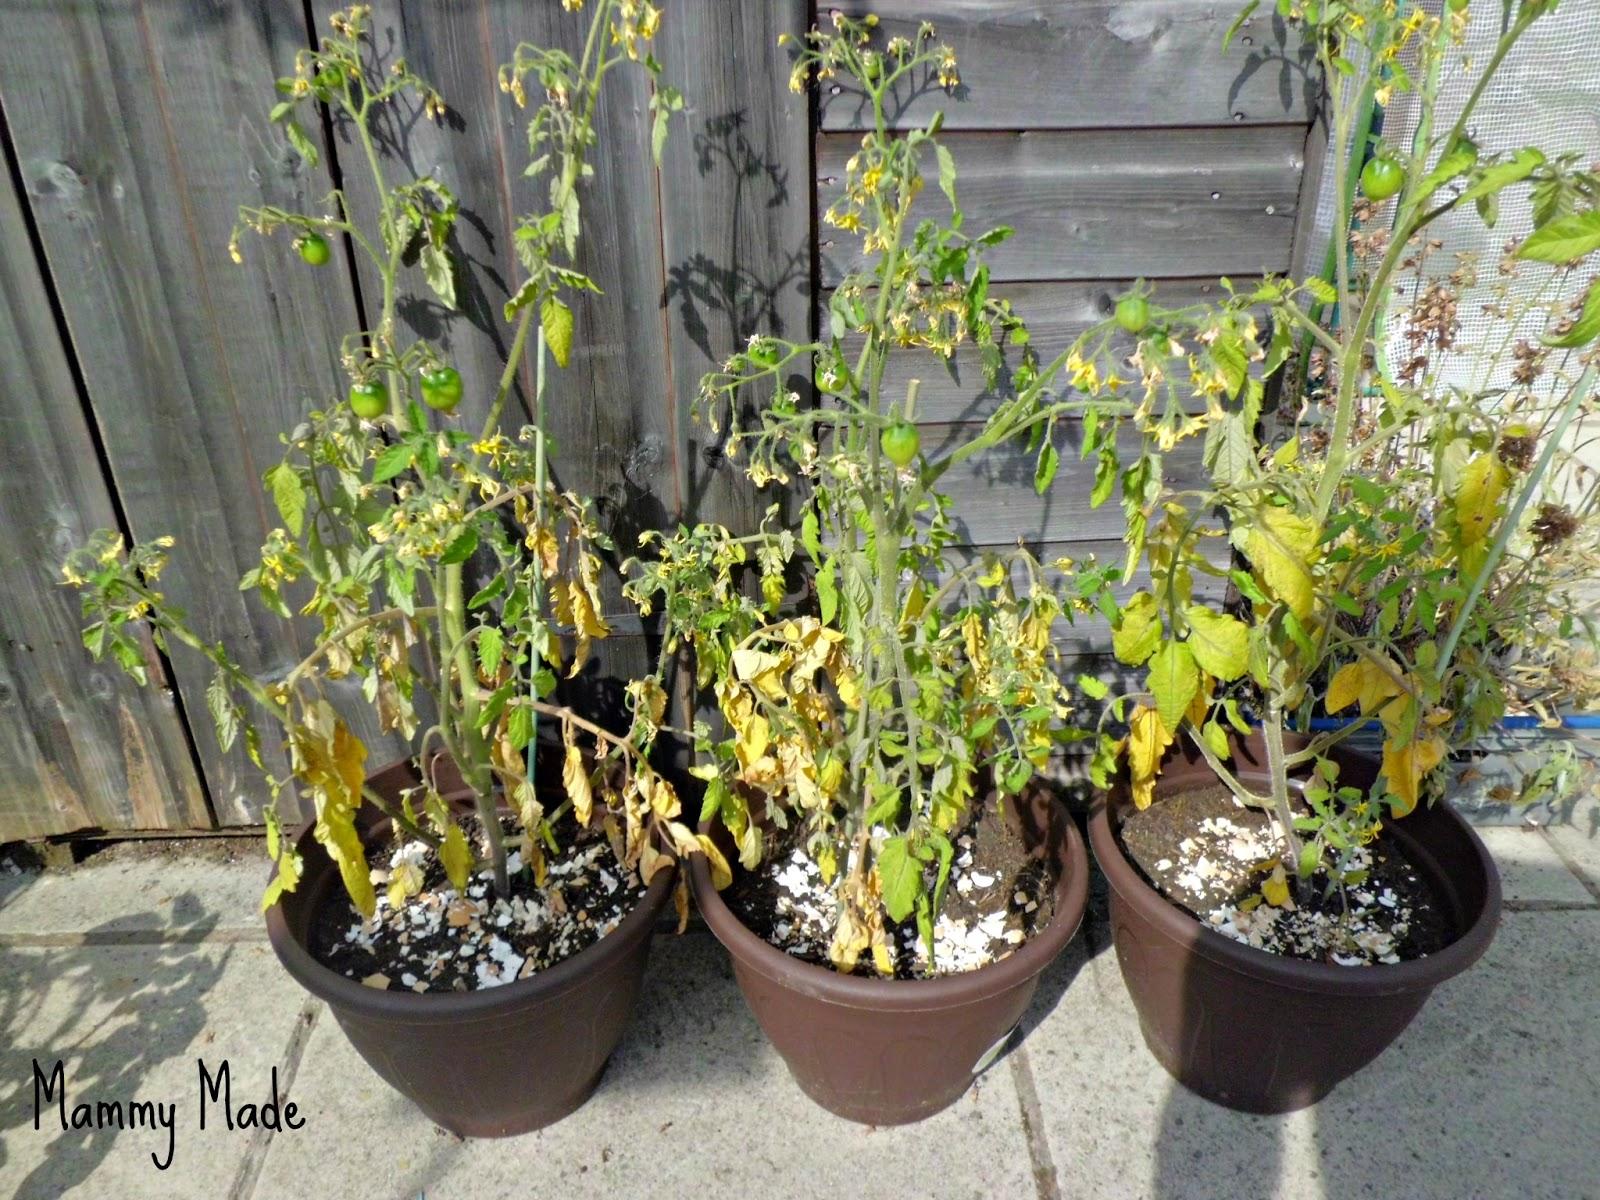 Mammy Made: My Homegrown Vegetable Patio Garden - Week 15